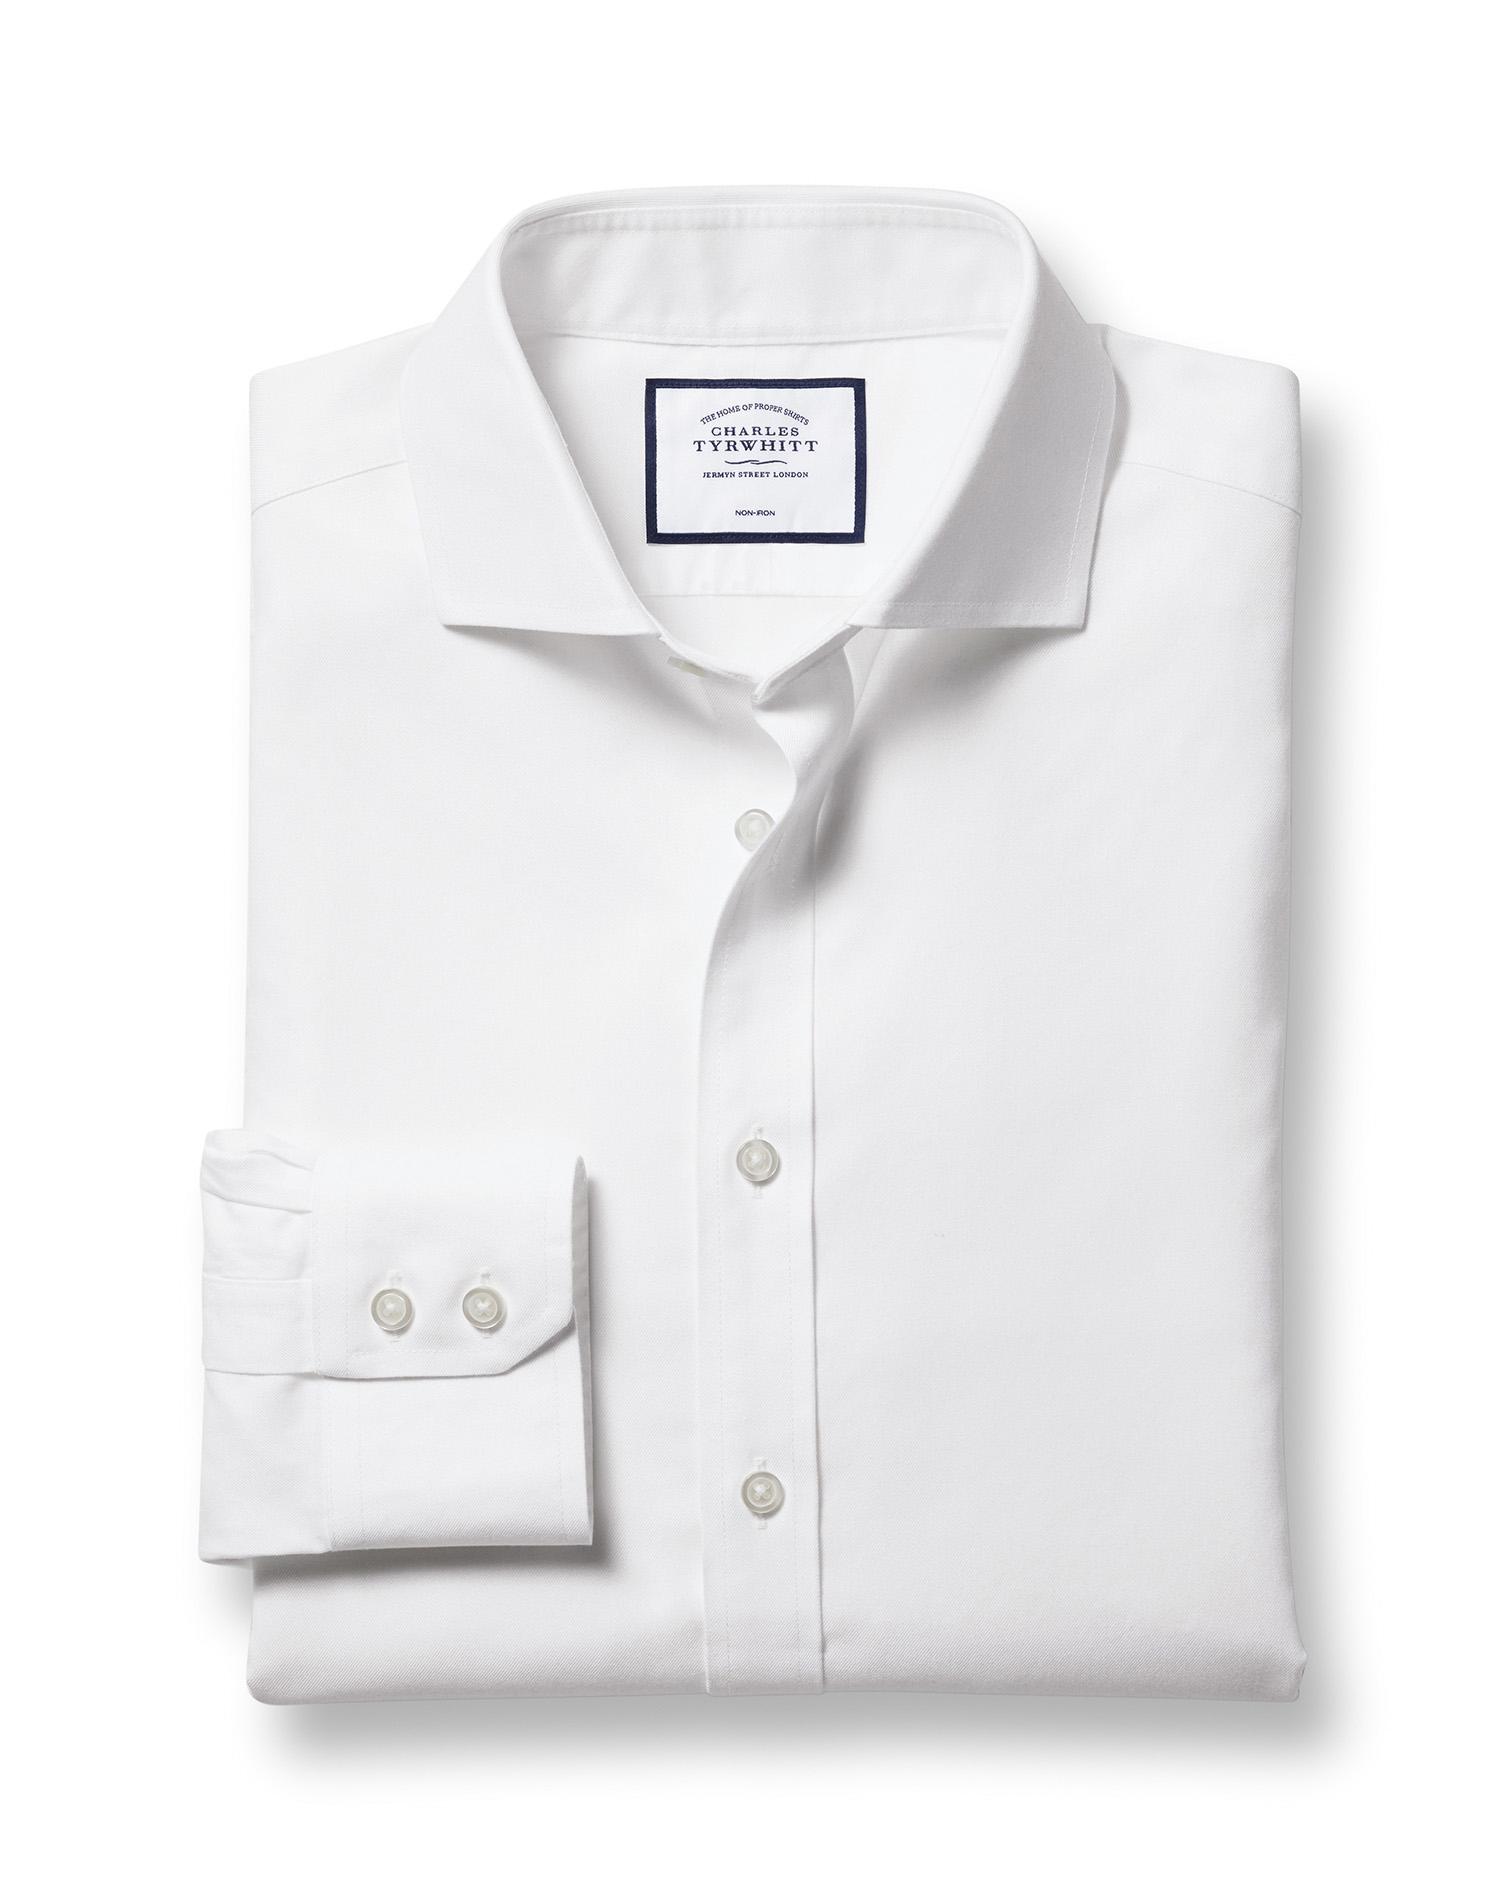 Slim Fit White Non-Iron Twill Cutaway Collar Cotton Formal Shirt by Charles Tyrwhitt